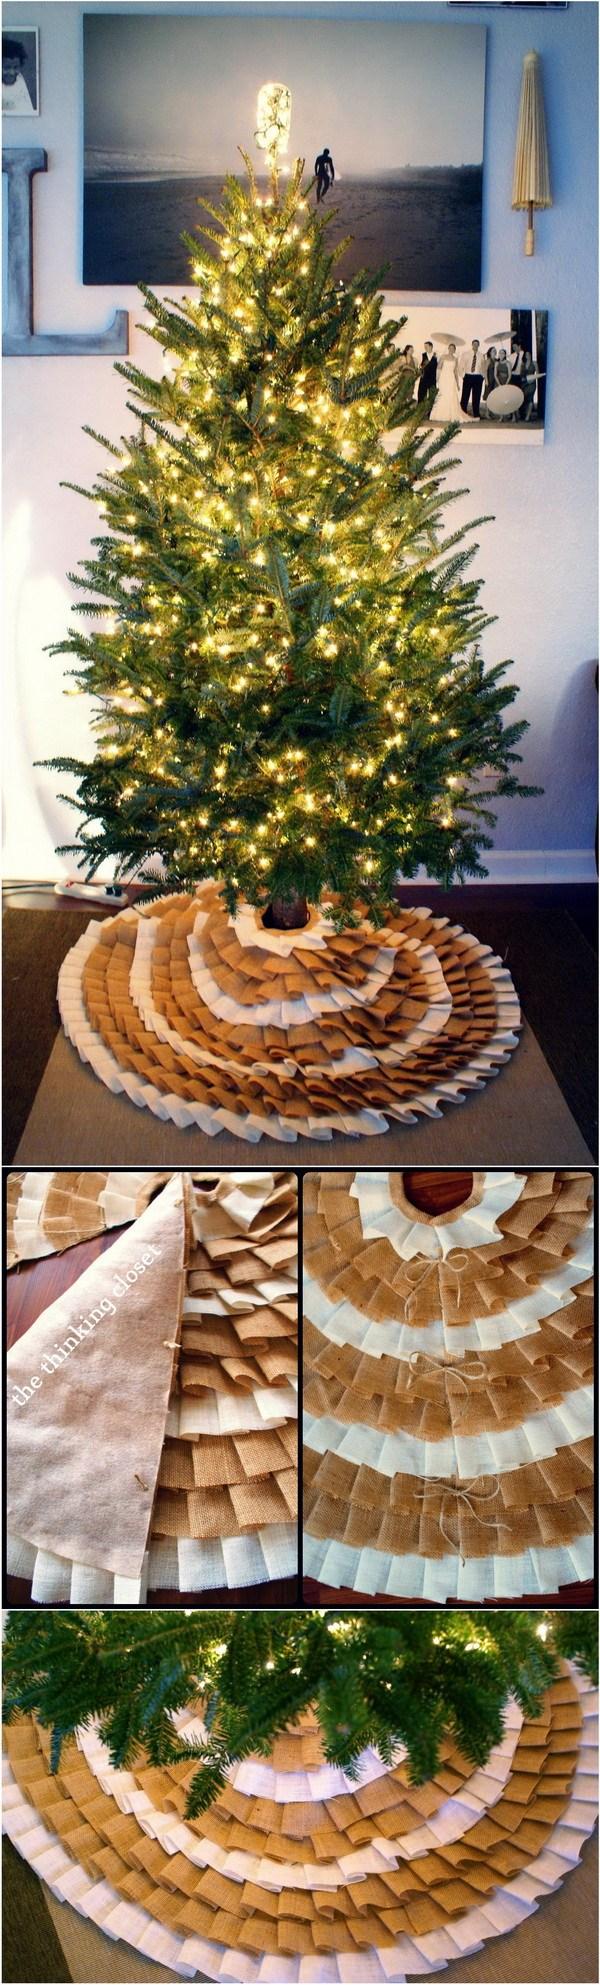 Enchanting Diy No Sew Ruffle Tree Diy Tree Skirt Ideas Hative Tree Skirt Quilt Kit Tree Skirt Crochet houzz-02 Christmas Tree Skirts